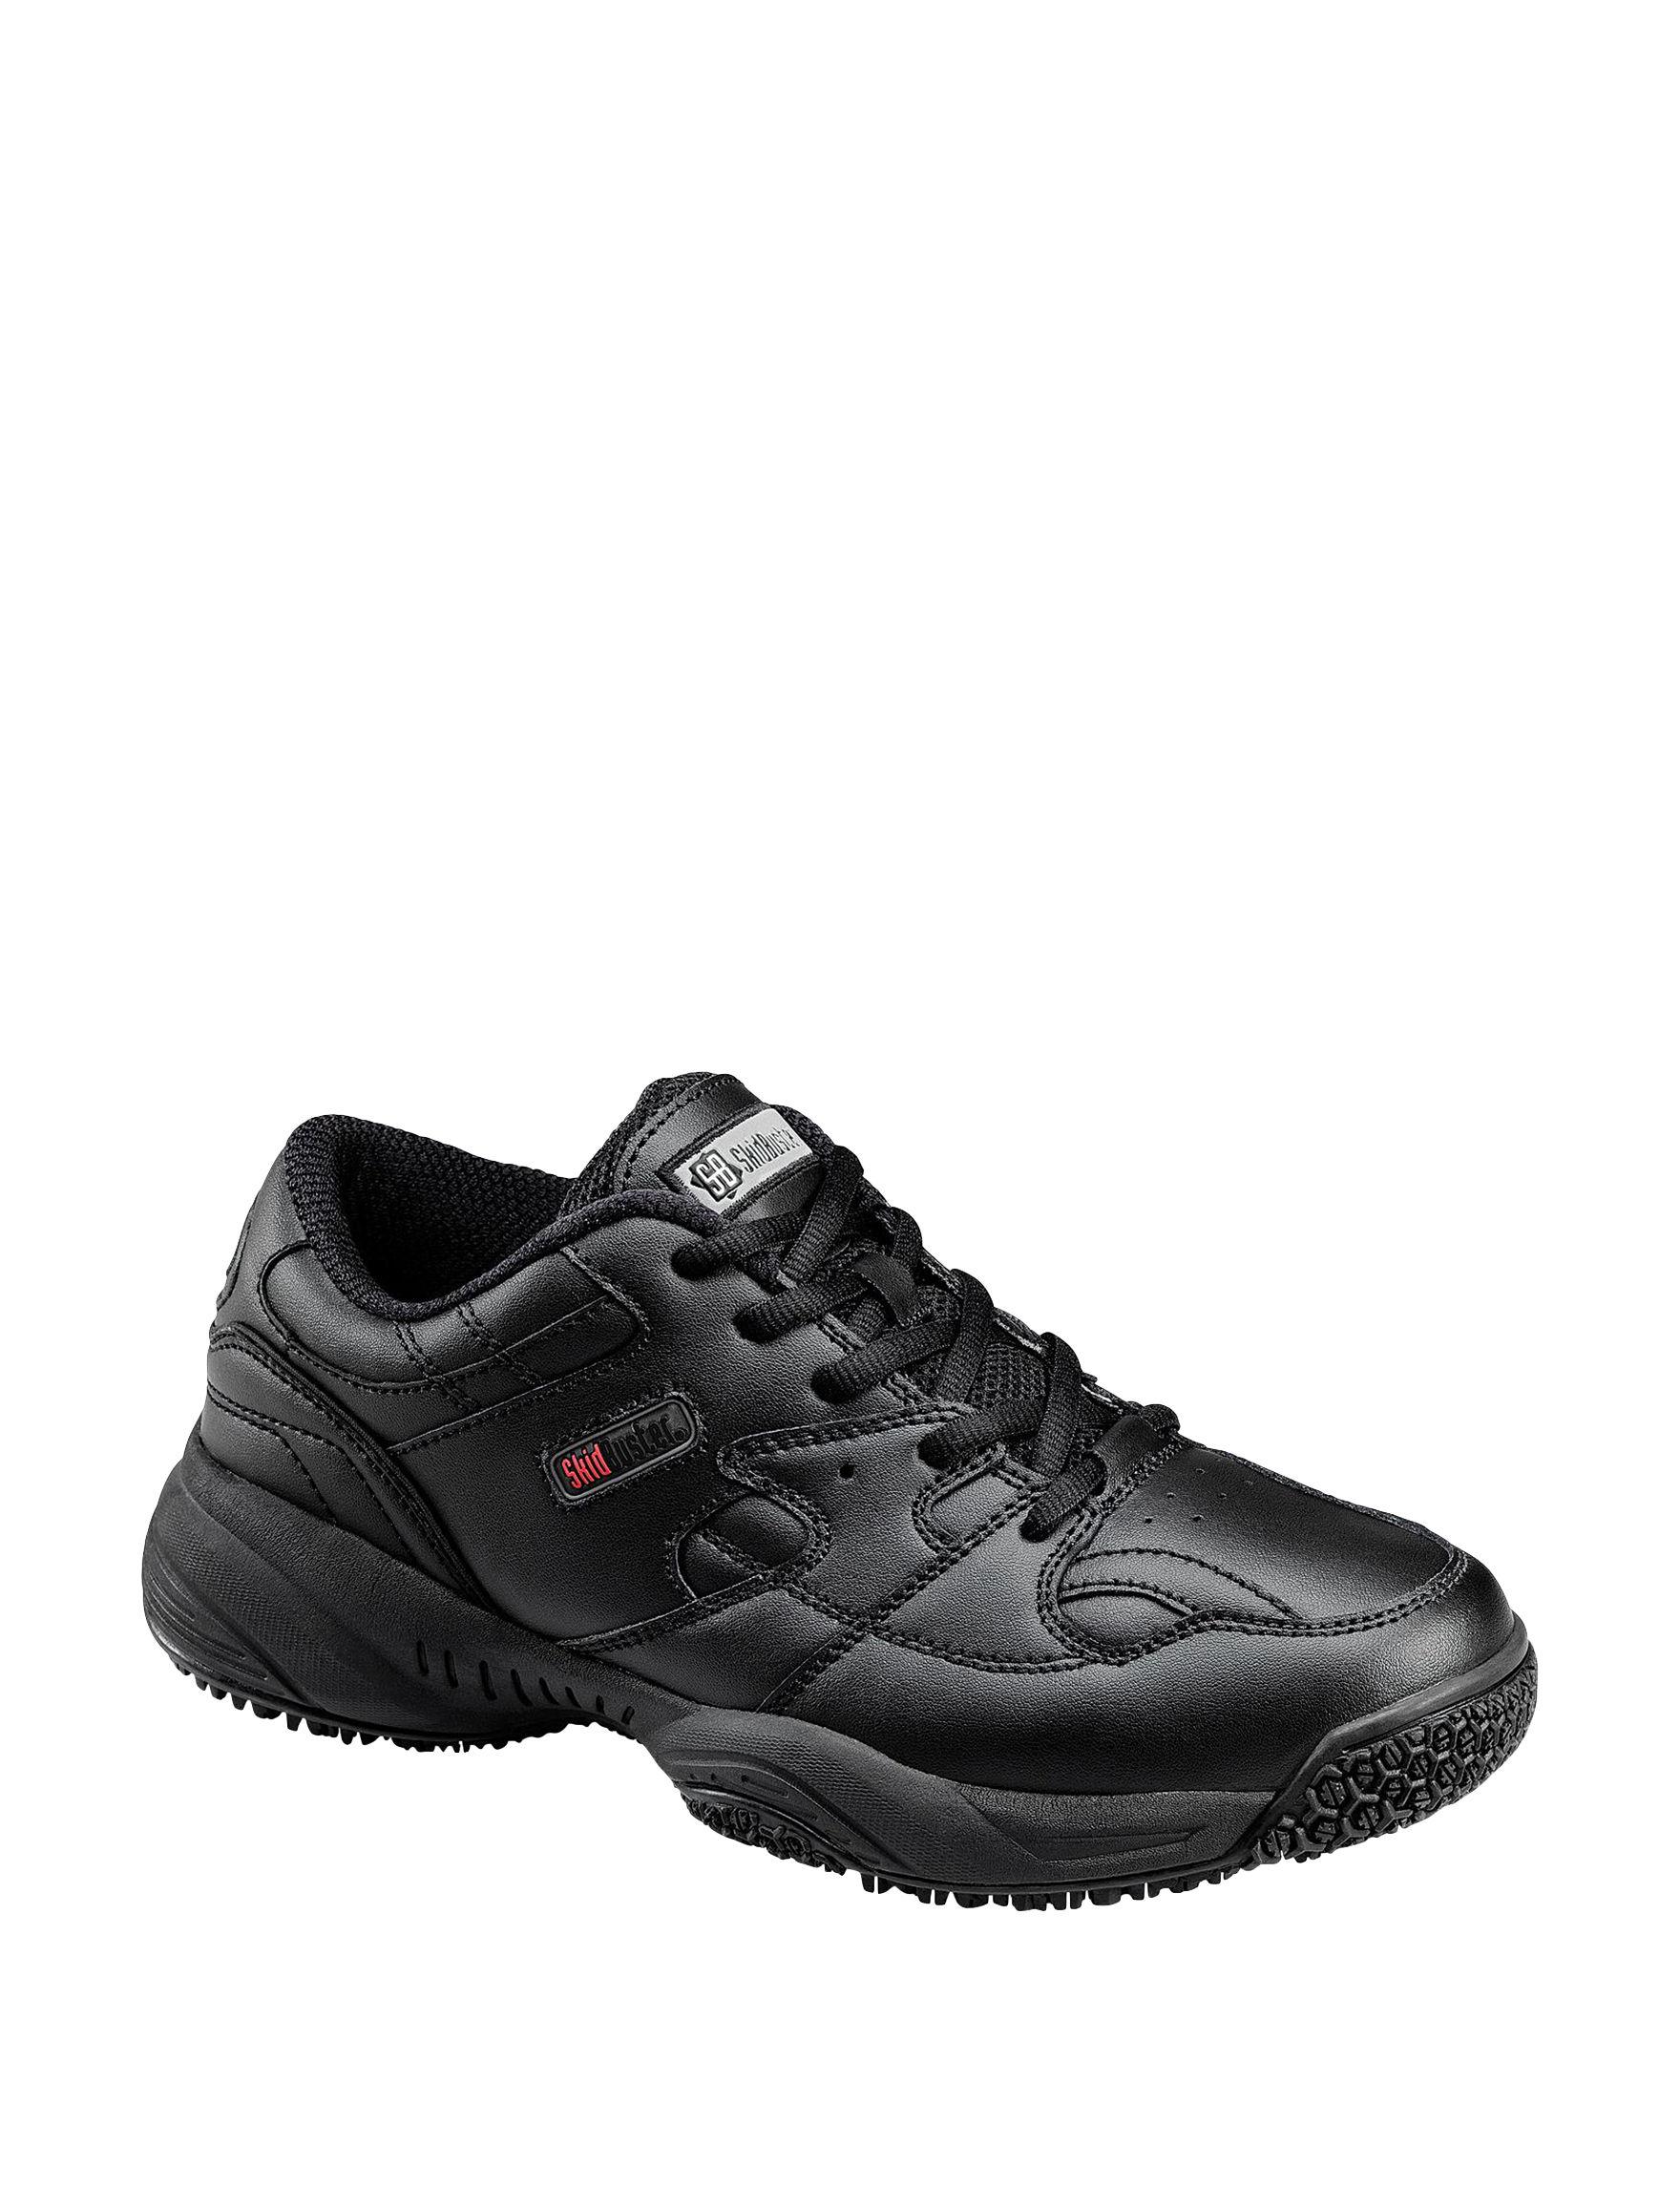 Skidbuster Black Slip Resistant